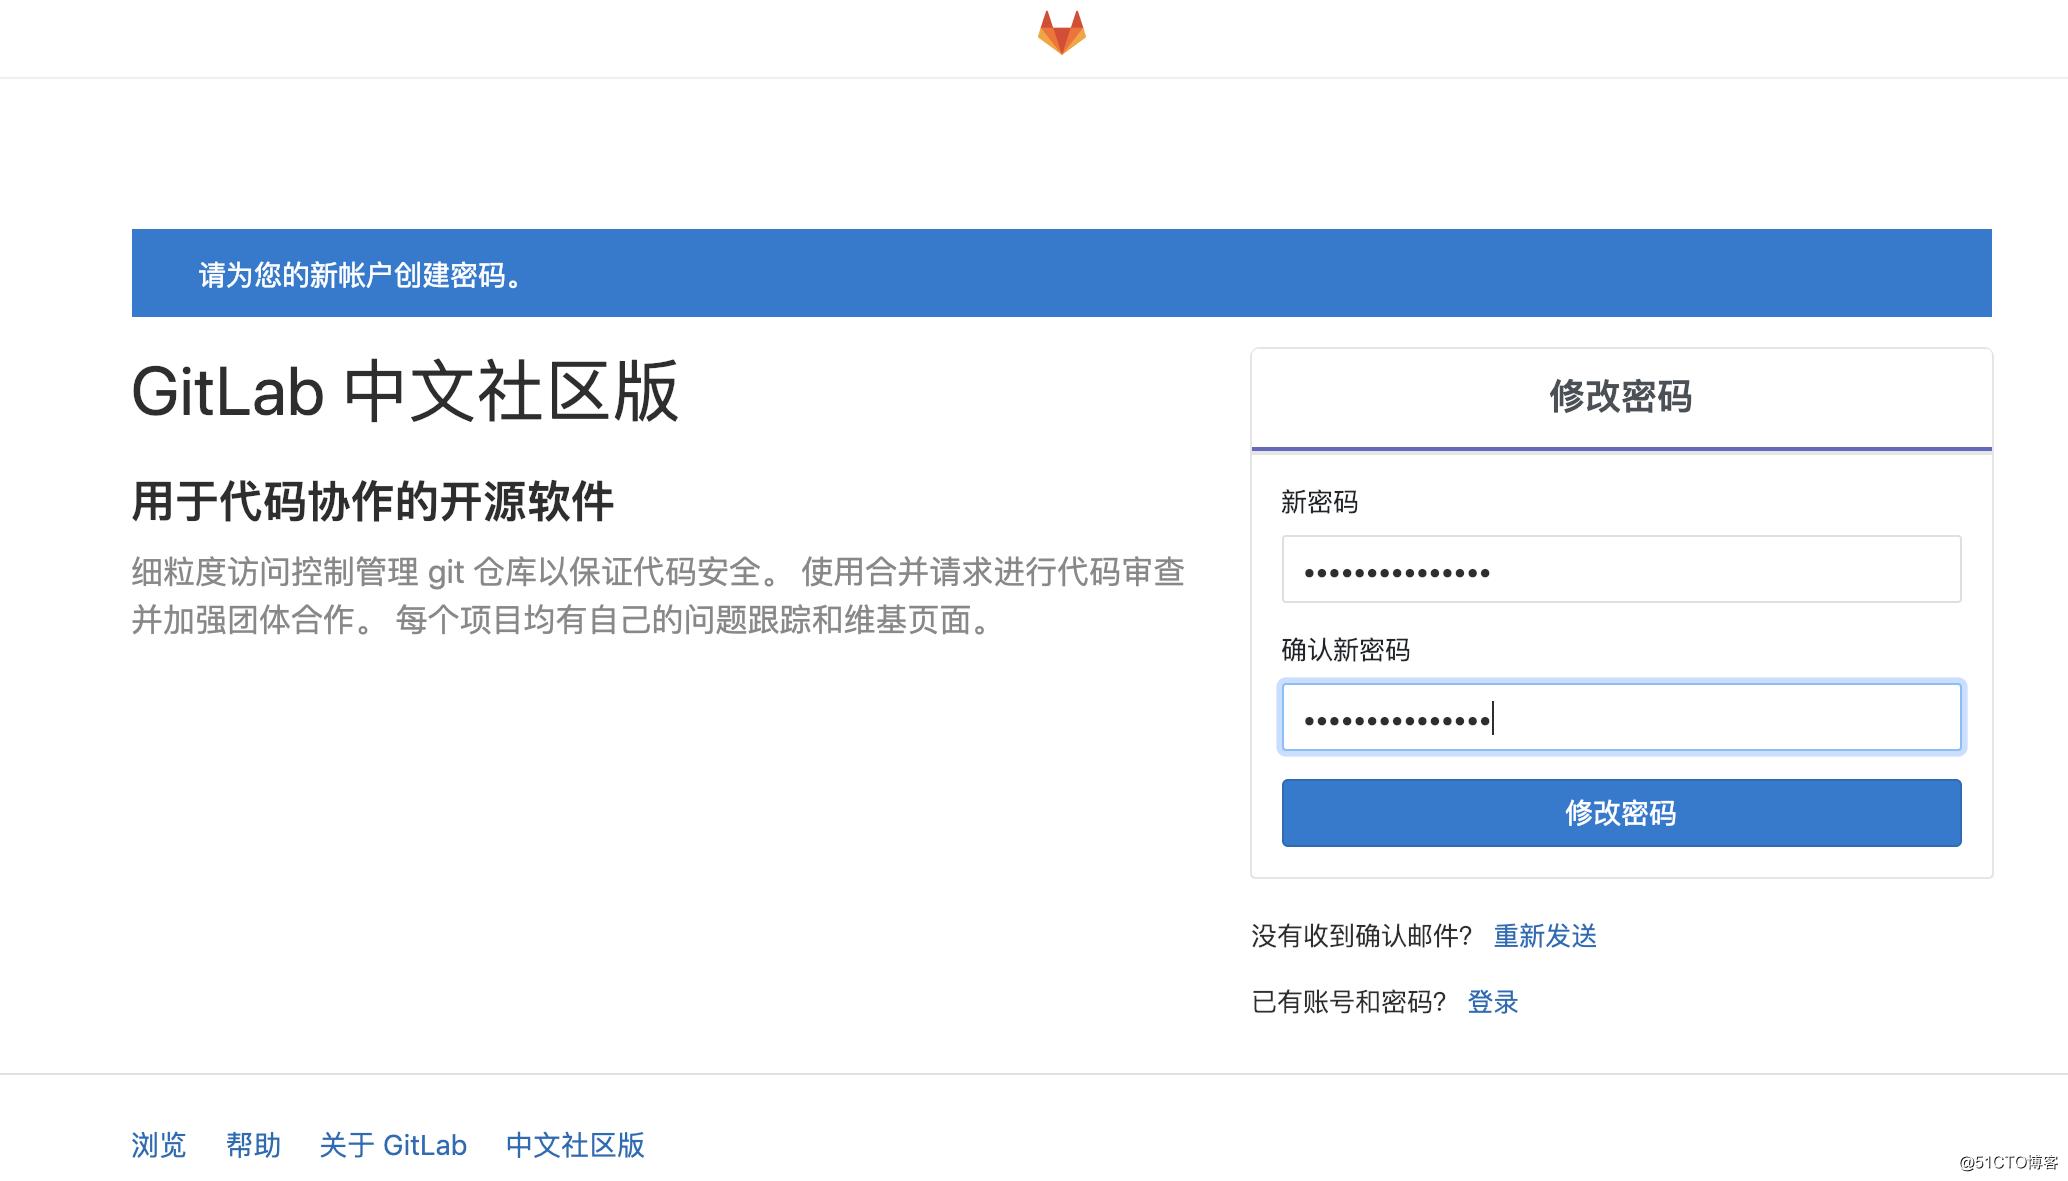 Docker-compose一键部署gitlab中文版